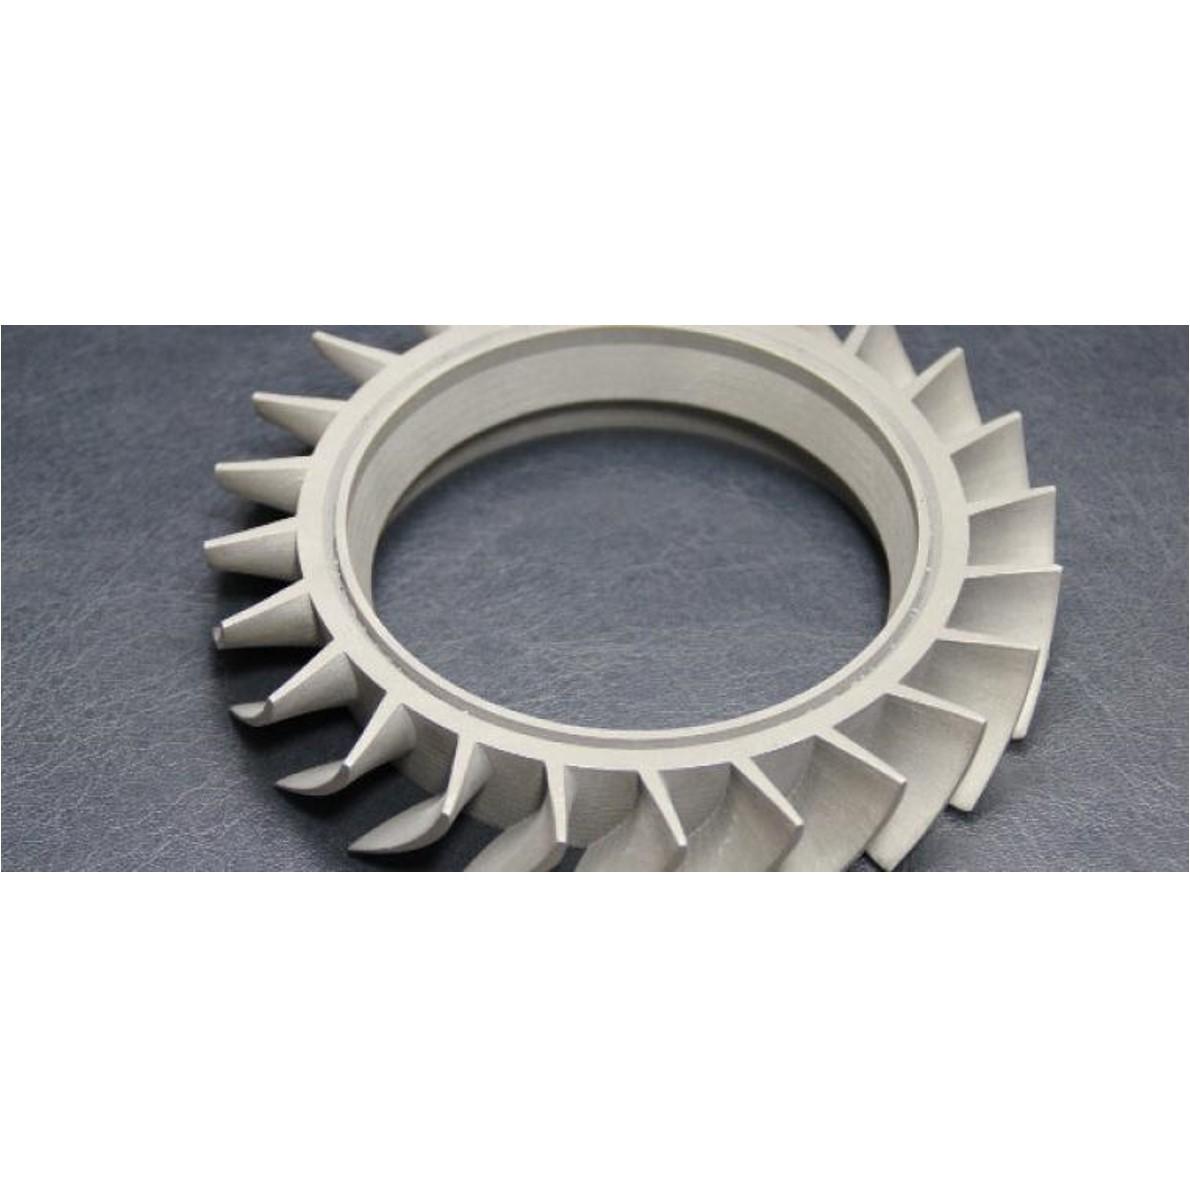 3d-systems-prox-200-turbine-metal-part-banner.jpg